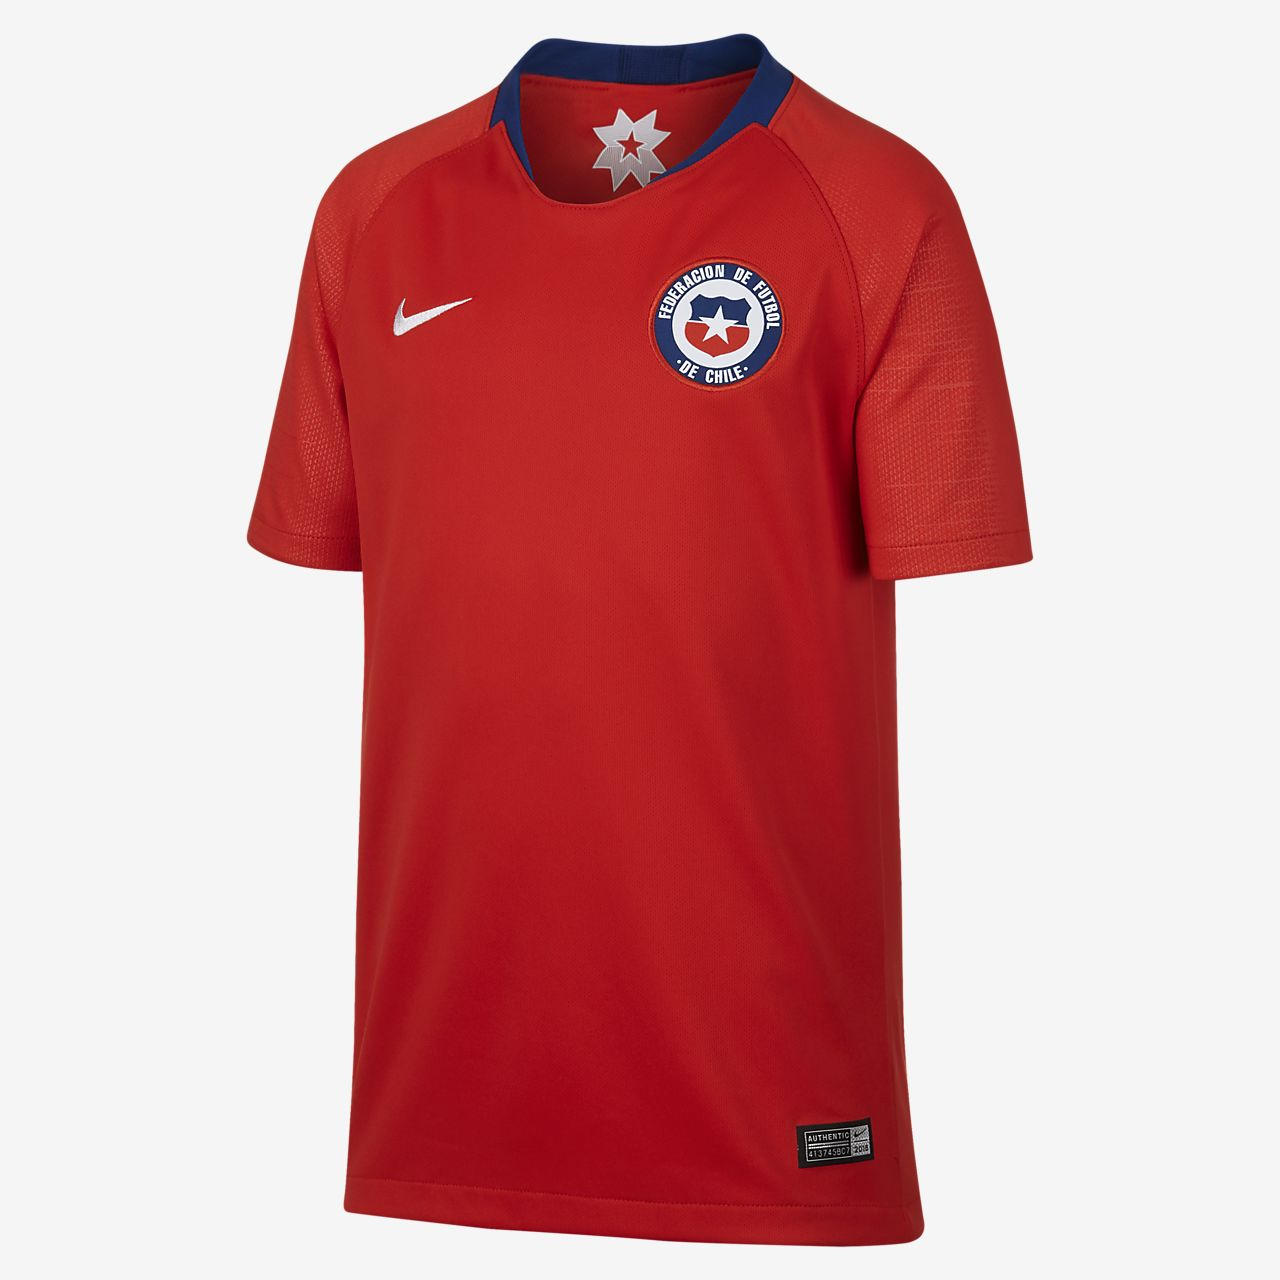 2018 Chile Stadium Home Older Kids' Football Shirt